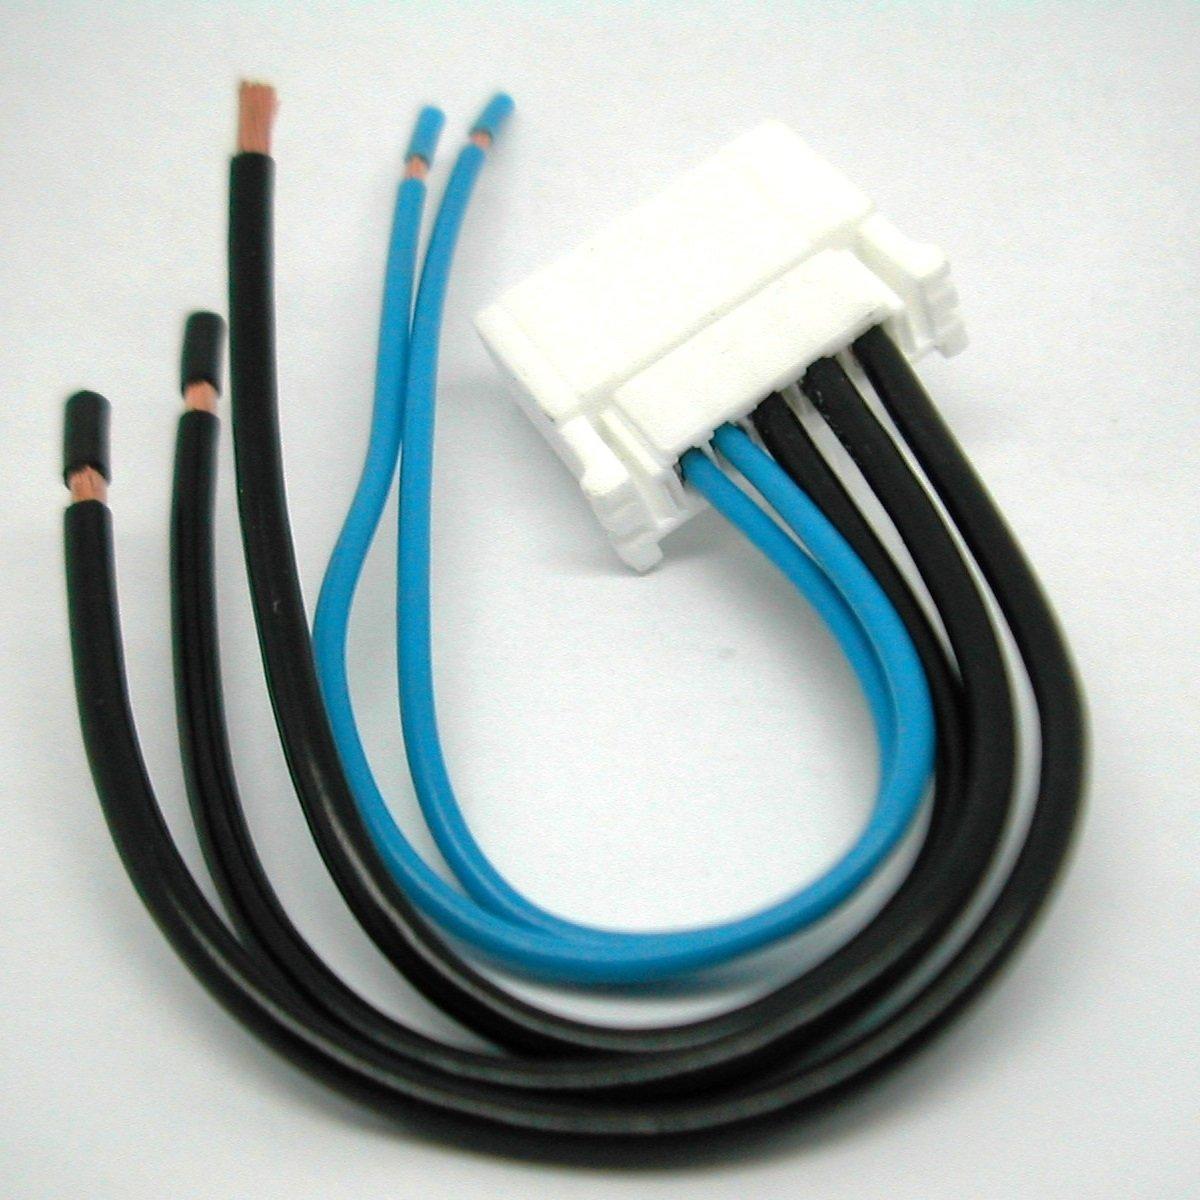 QDI Heater Blower Resistor Wiring Harness Loom repair kit plug ...